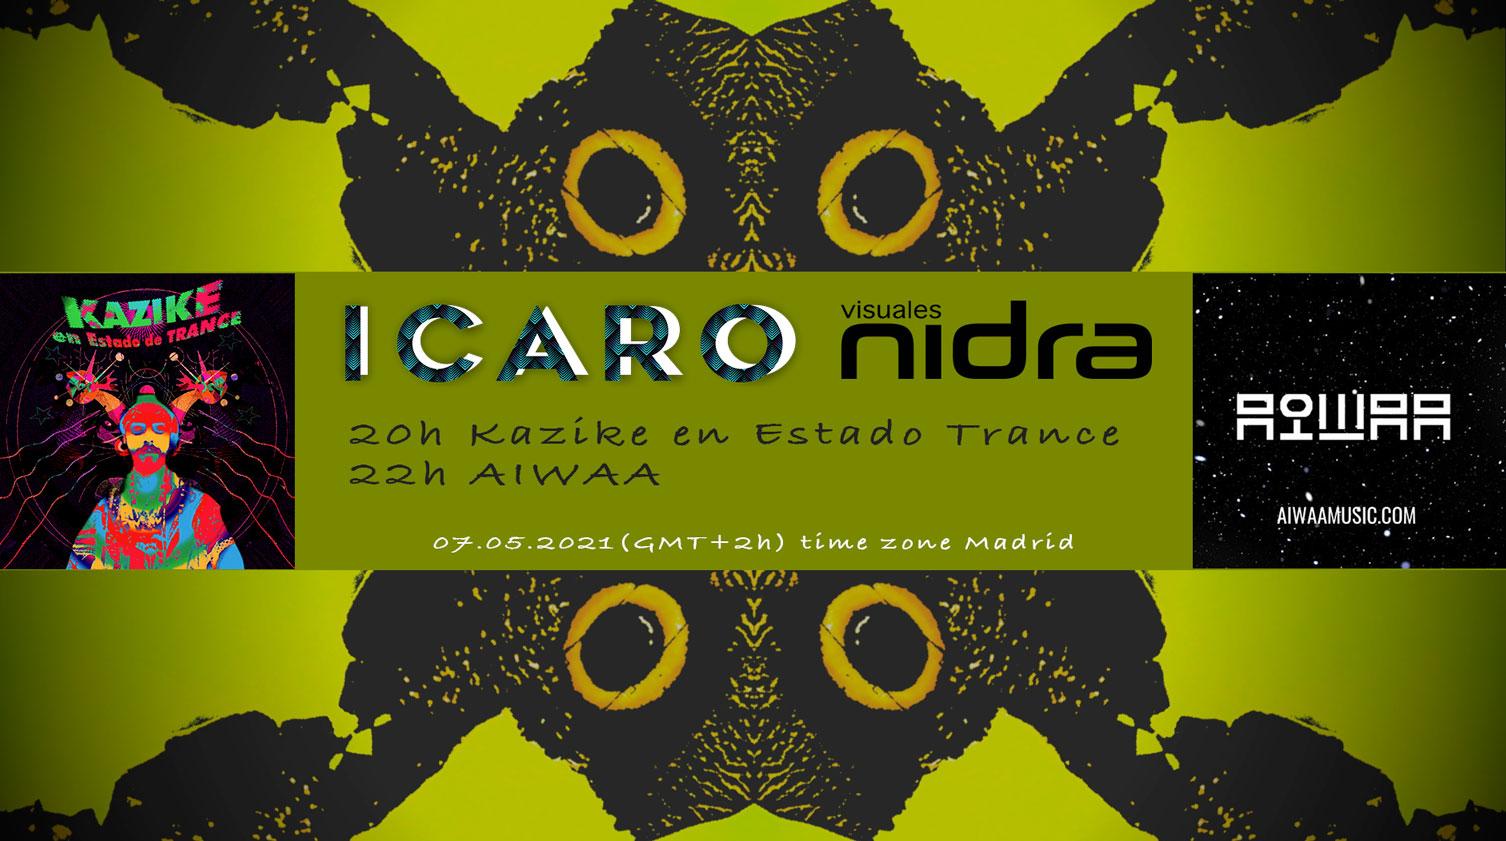 Aiwaa Kazike en Estado de Trance Icaro streaming session nidratv nidra tv Visuales Nidra